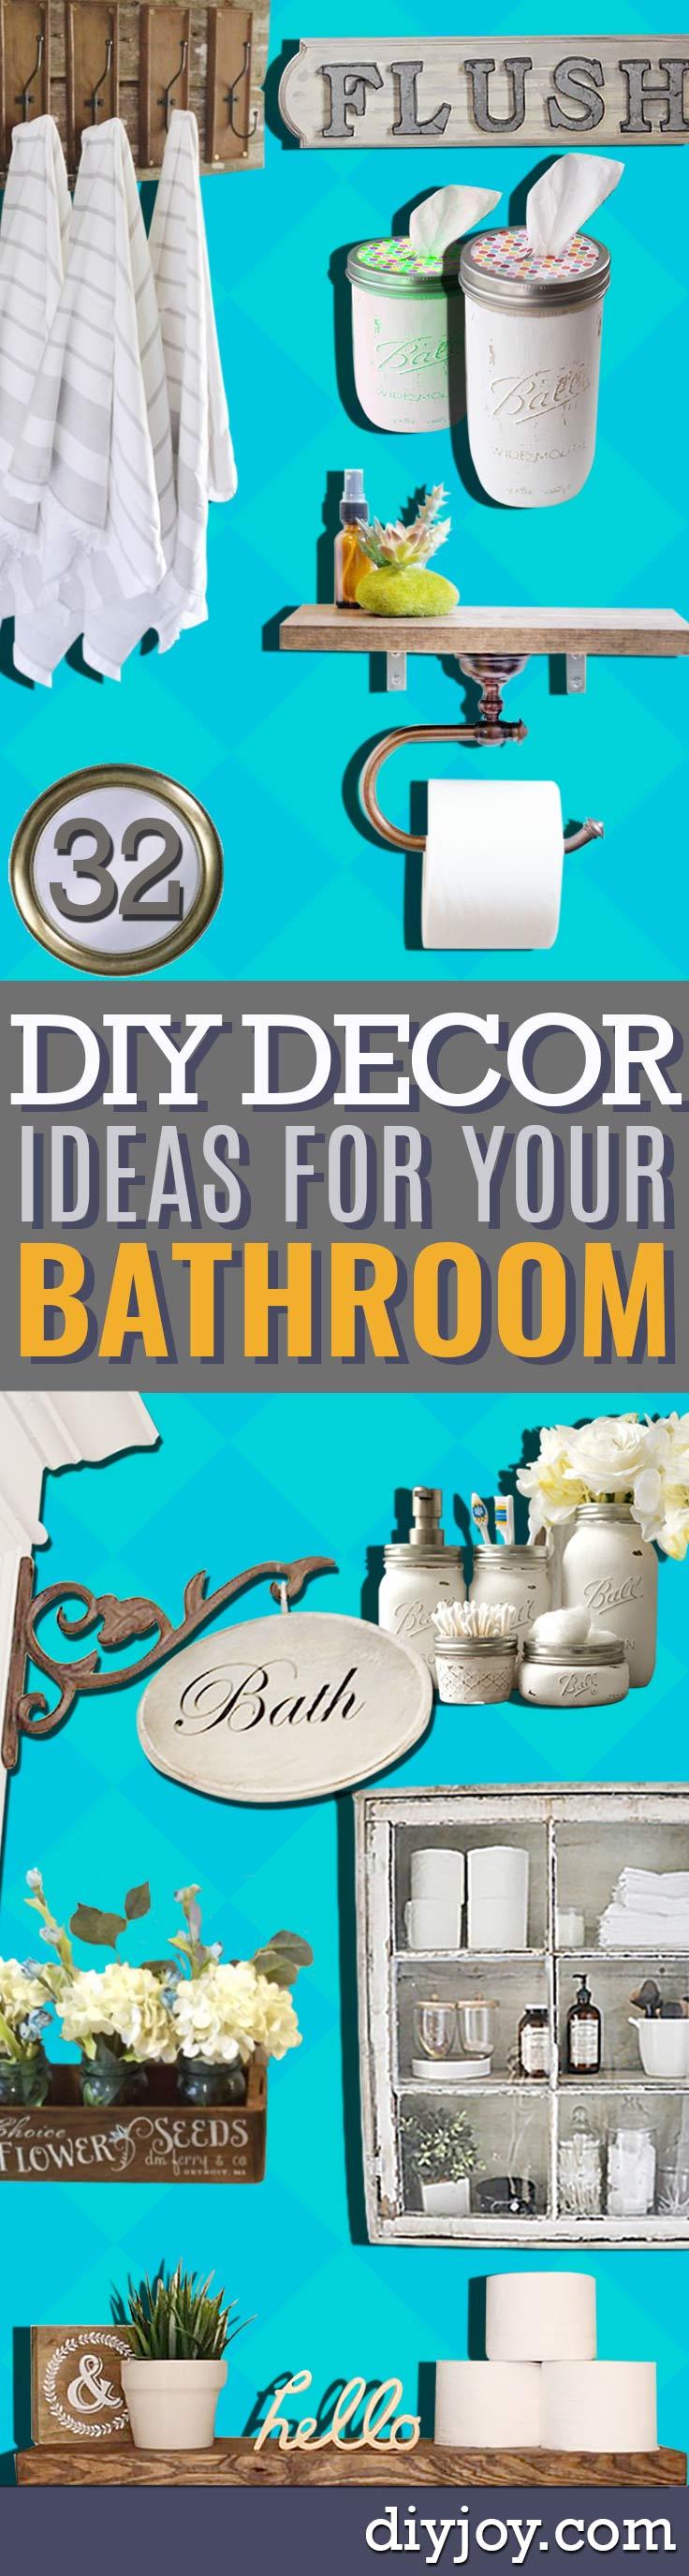 diy bathroom decor ideas- Cool DIY Bath Projects - Do It Yourself Bath Ideas on A Budget, Rustic Bathroom Fixtures, Creative Wall Art, Rugs, Mason Jar Accessories